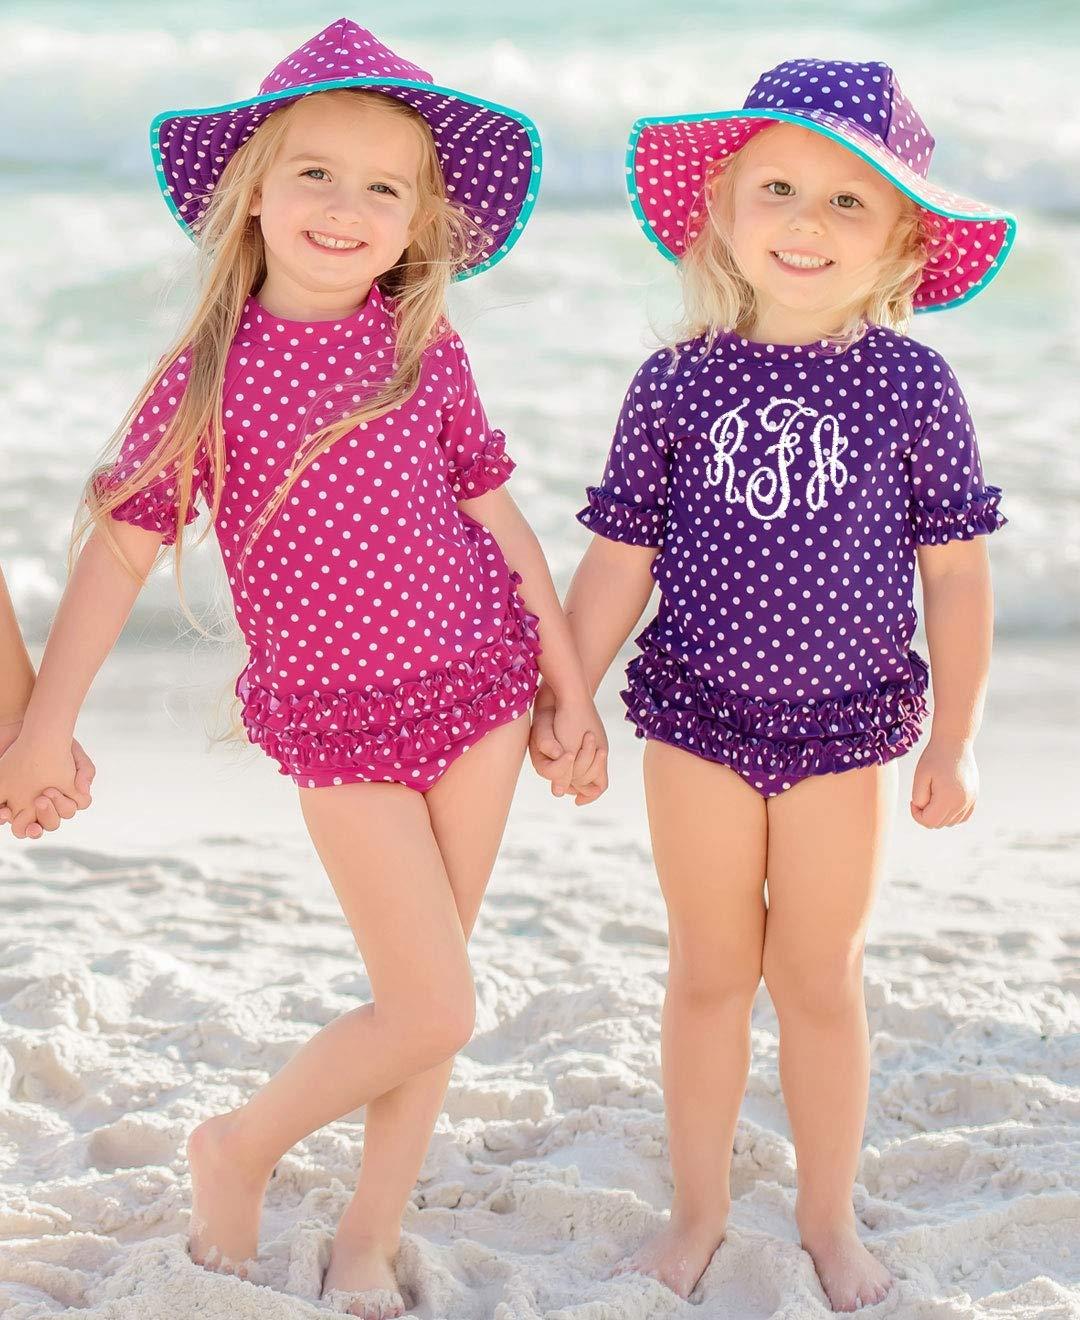 RuffleButts Little Girls Rash Guard 2-Piece Swimsuit Set - Berry Polka Dot Bikini with UPF 50+ Sun Protection - 3T by RuffleButts (Image #3)